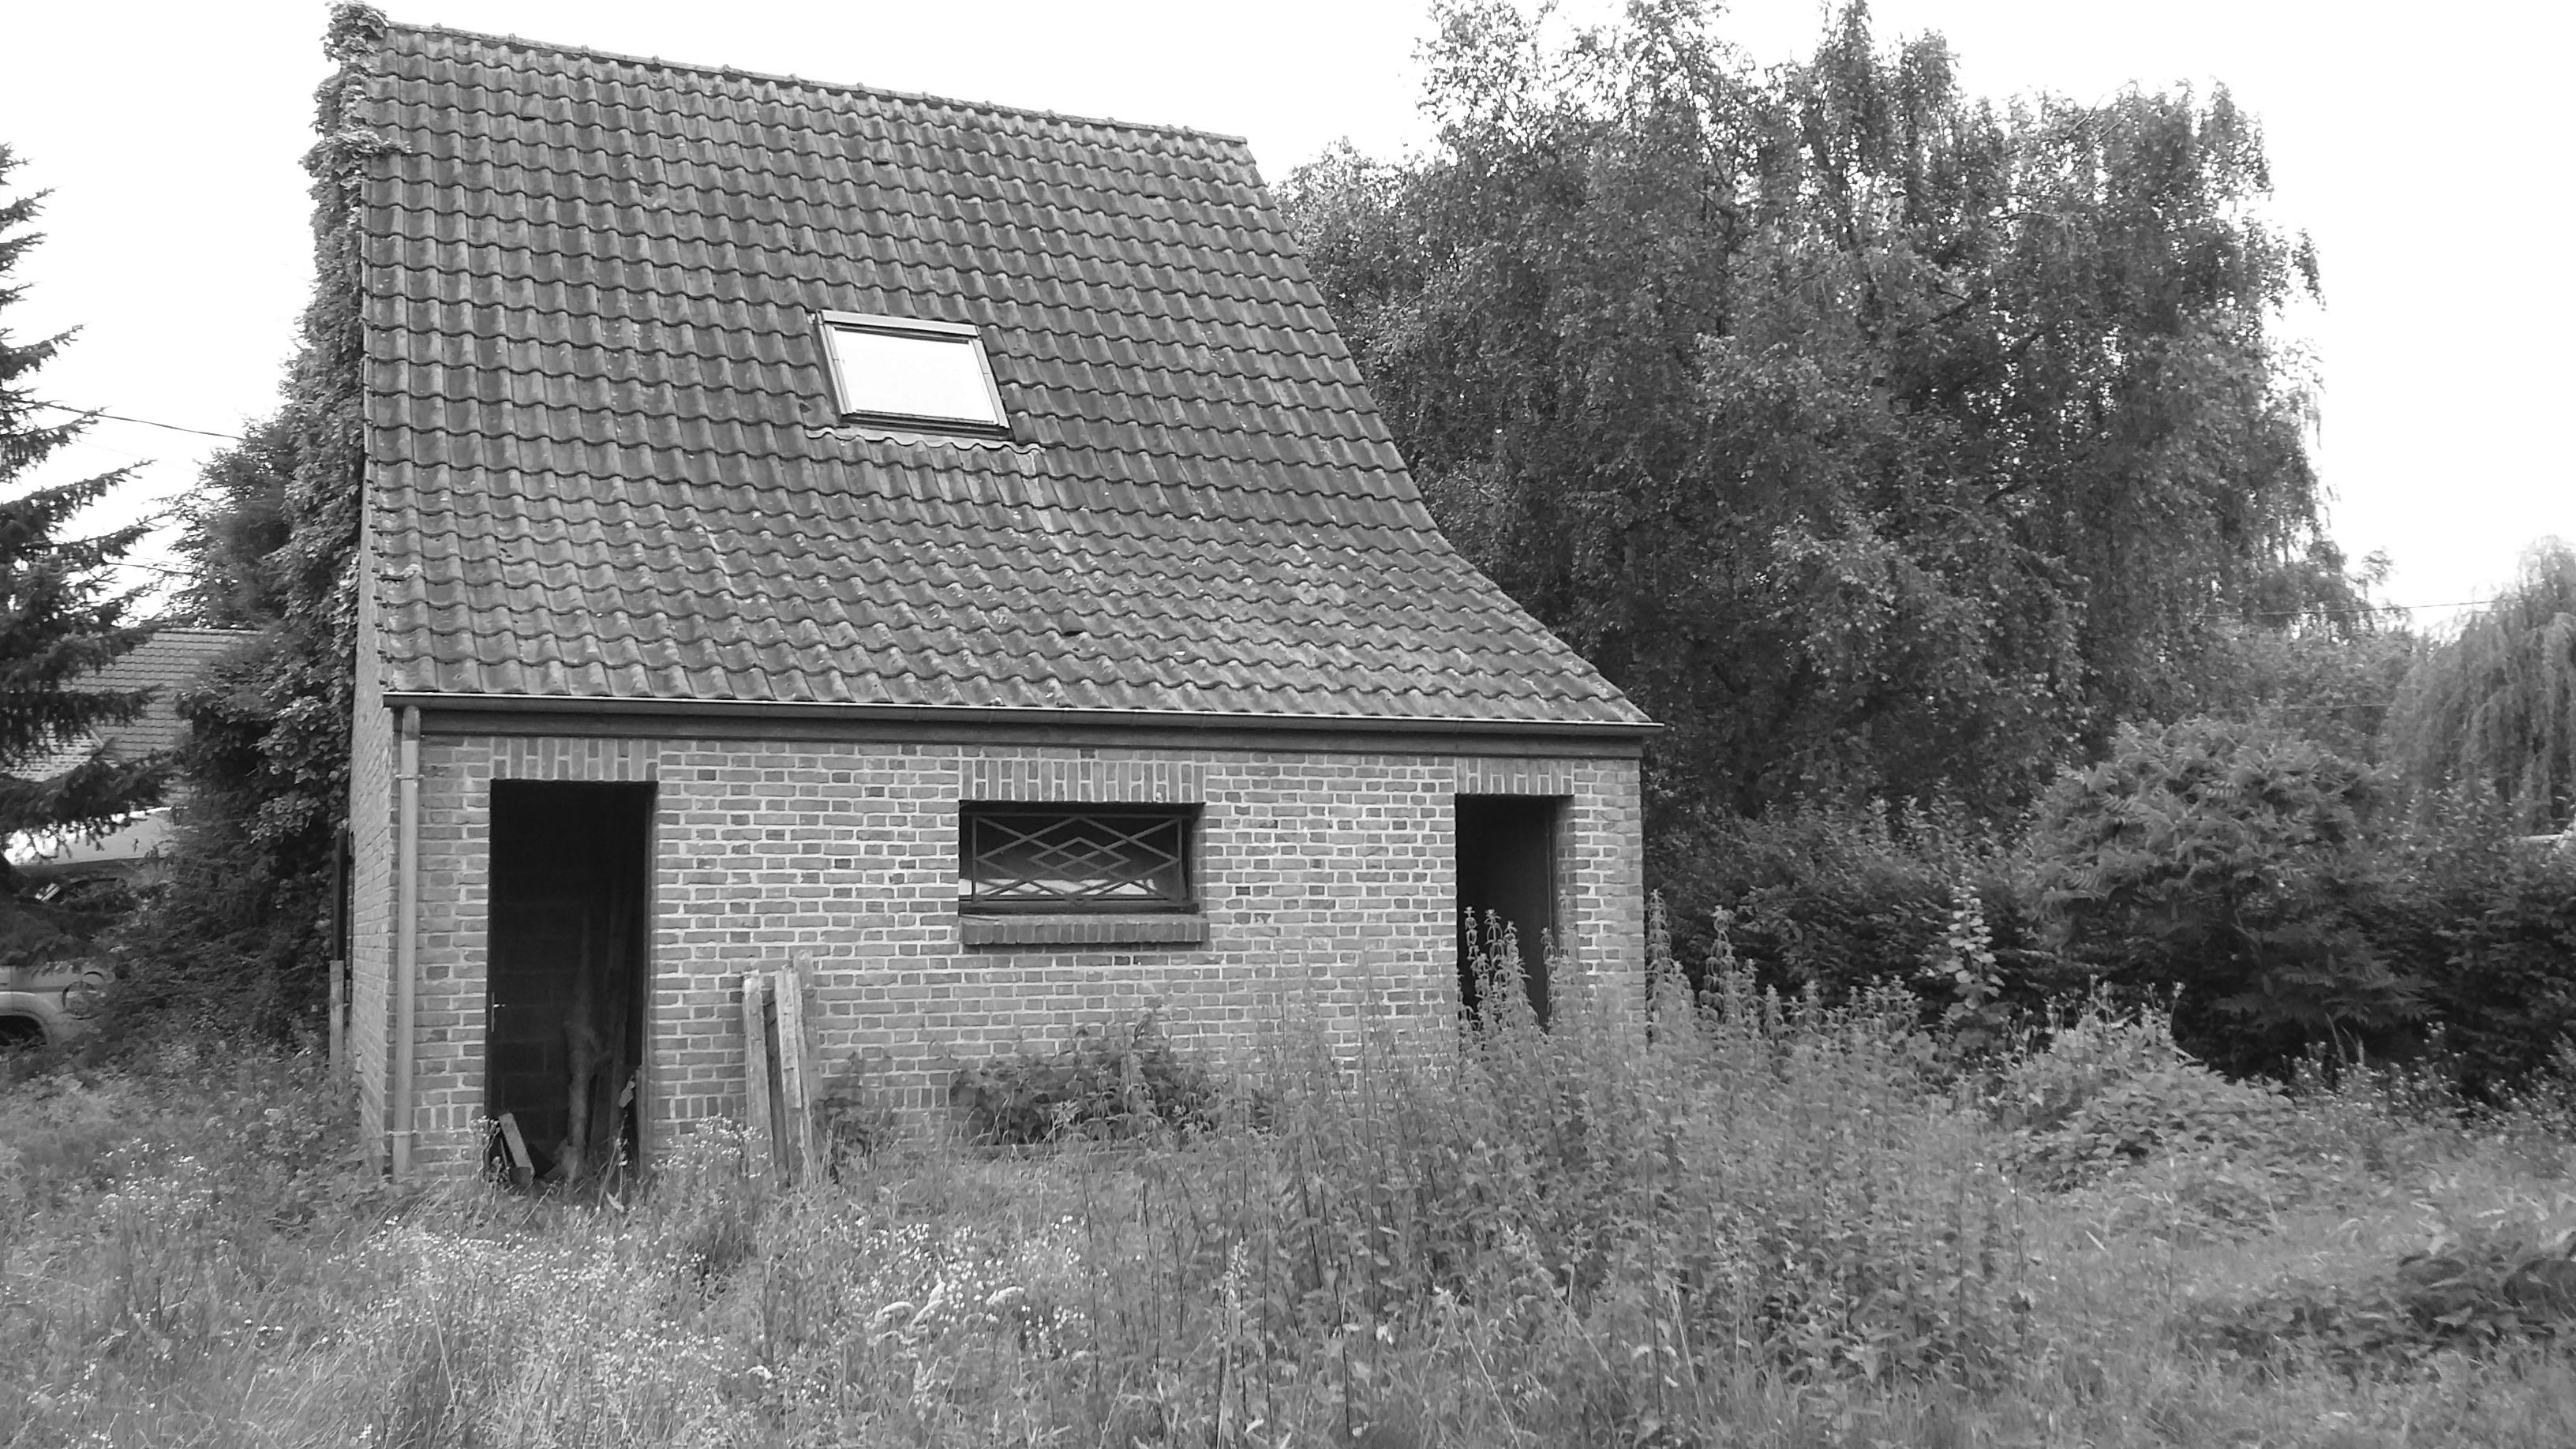 16.32 atelier permis de construire Verlinghem12